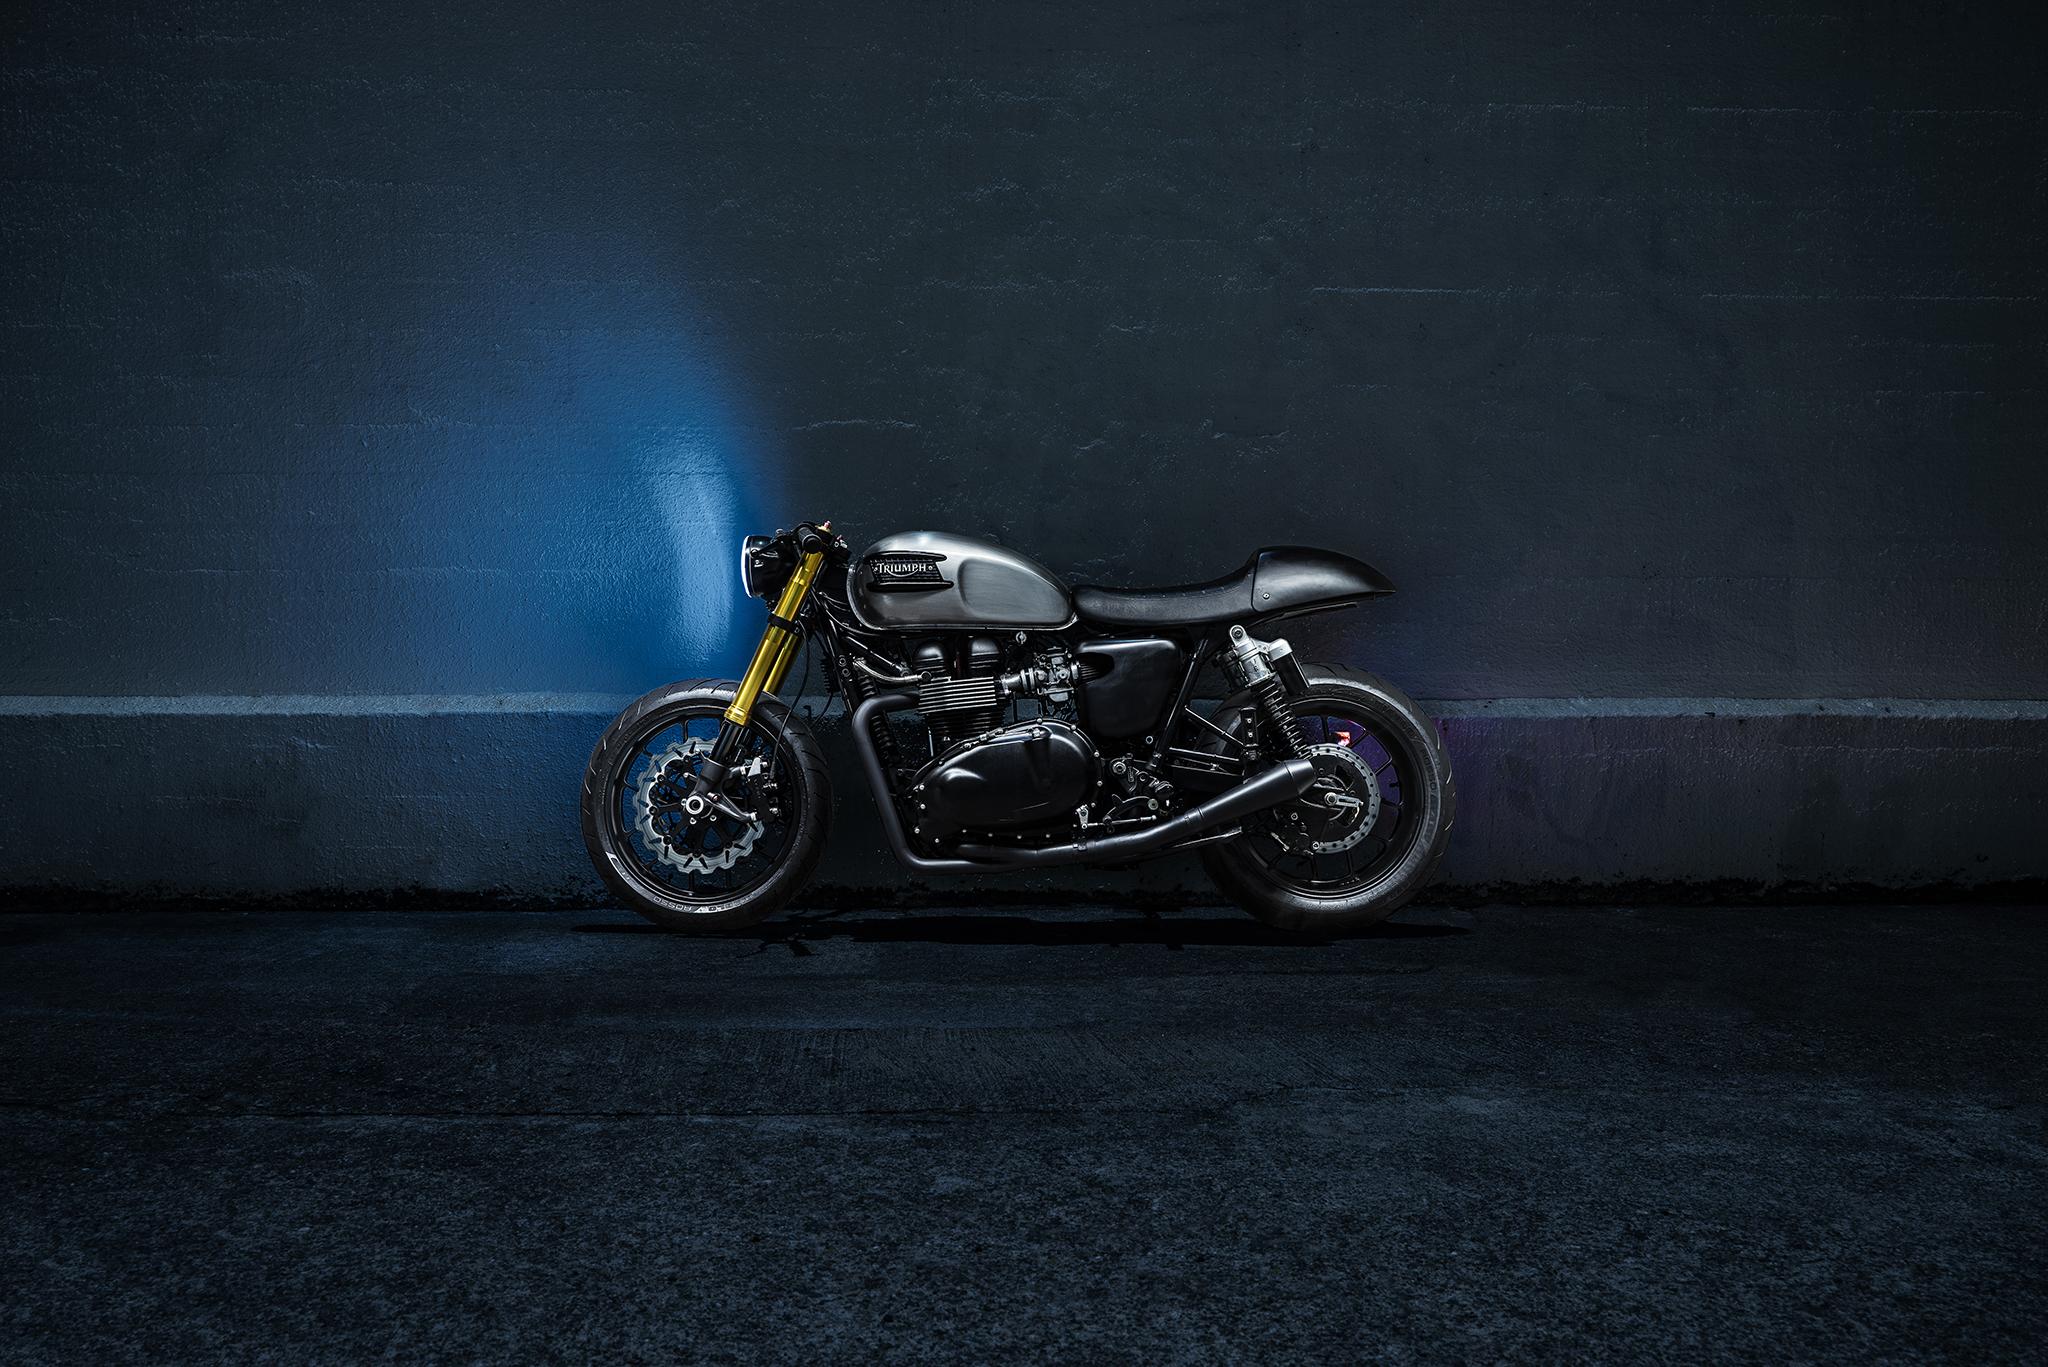 55480 скачать обои Мотоциклы, Triumph Bonneville, Мотоцикл, Стена - заставки и картинки бесплатно